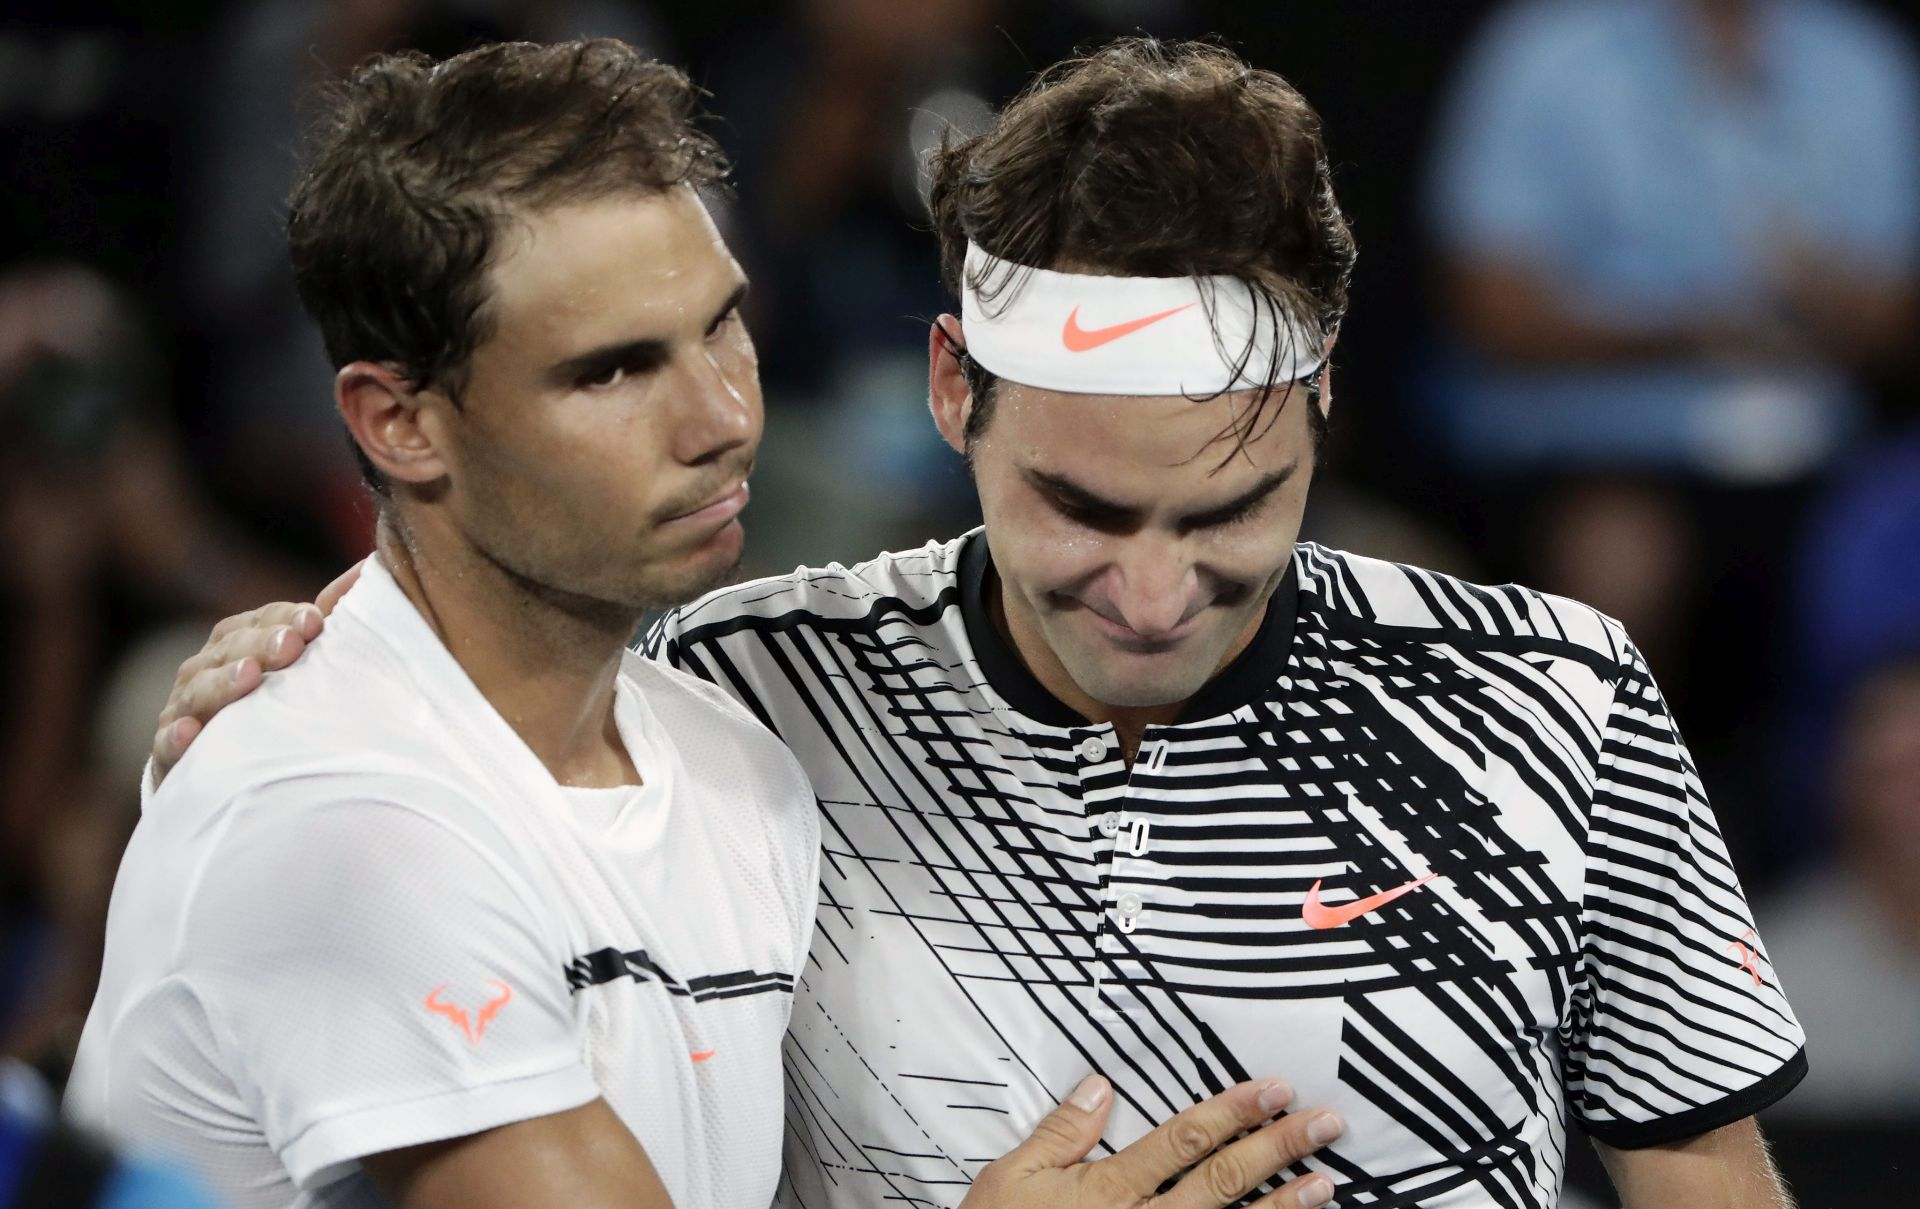 U petak u polufinalu Federer – Nadal po 40. put